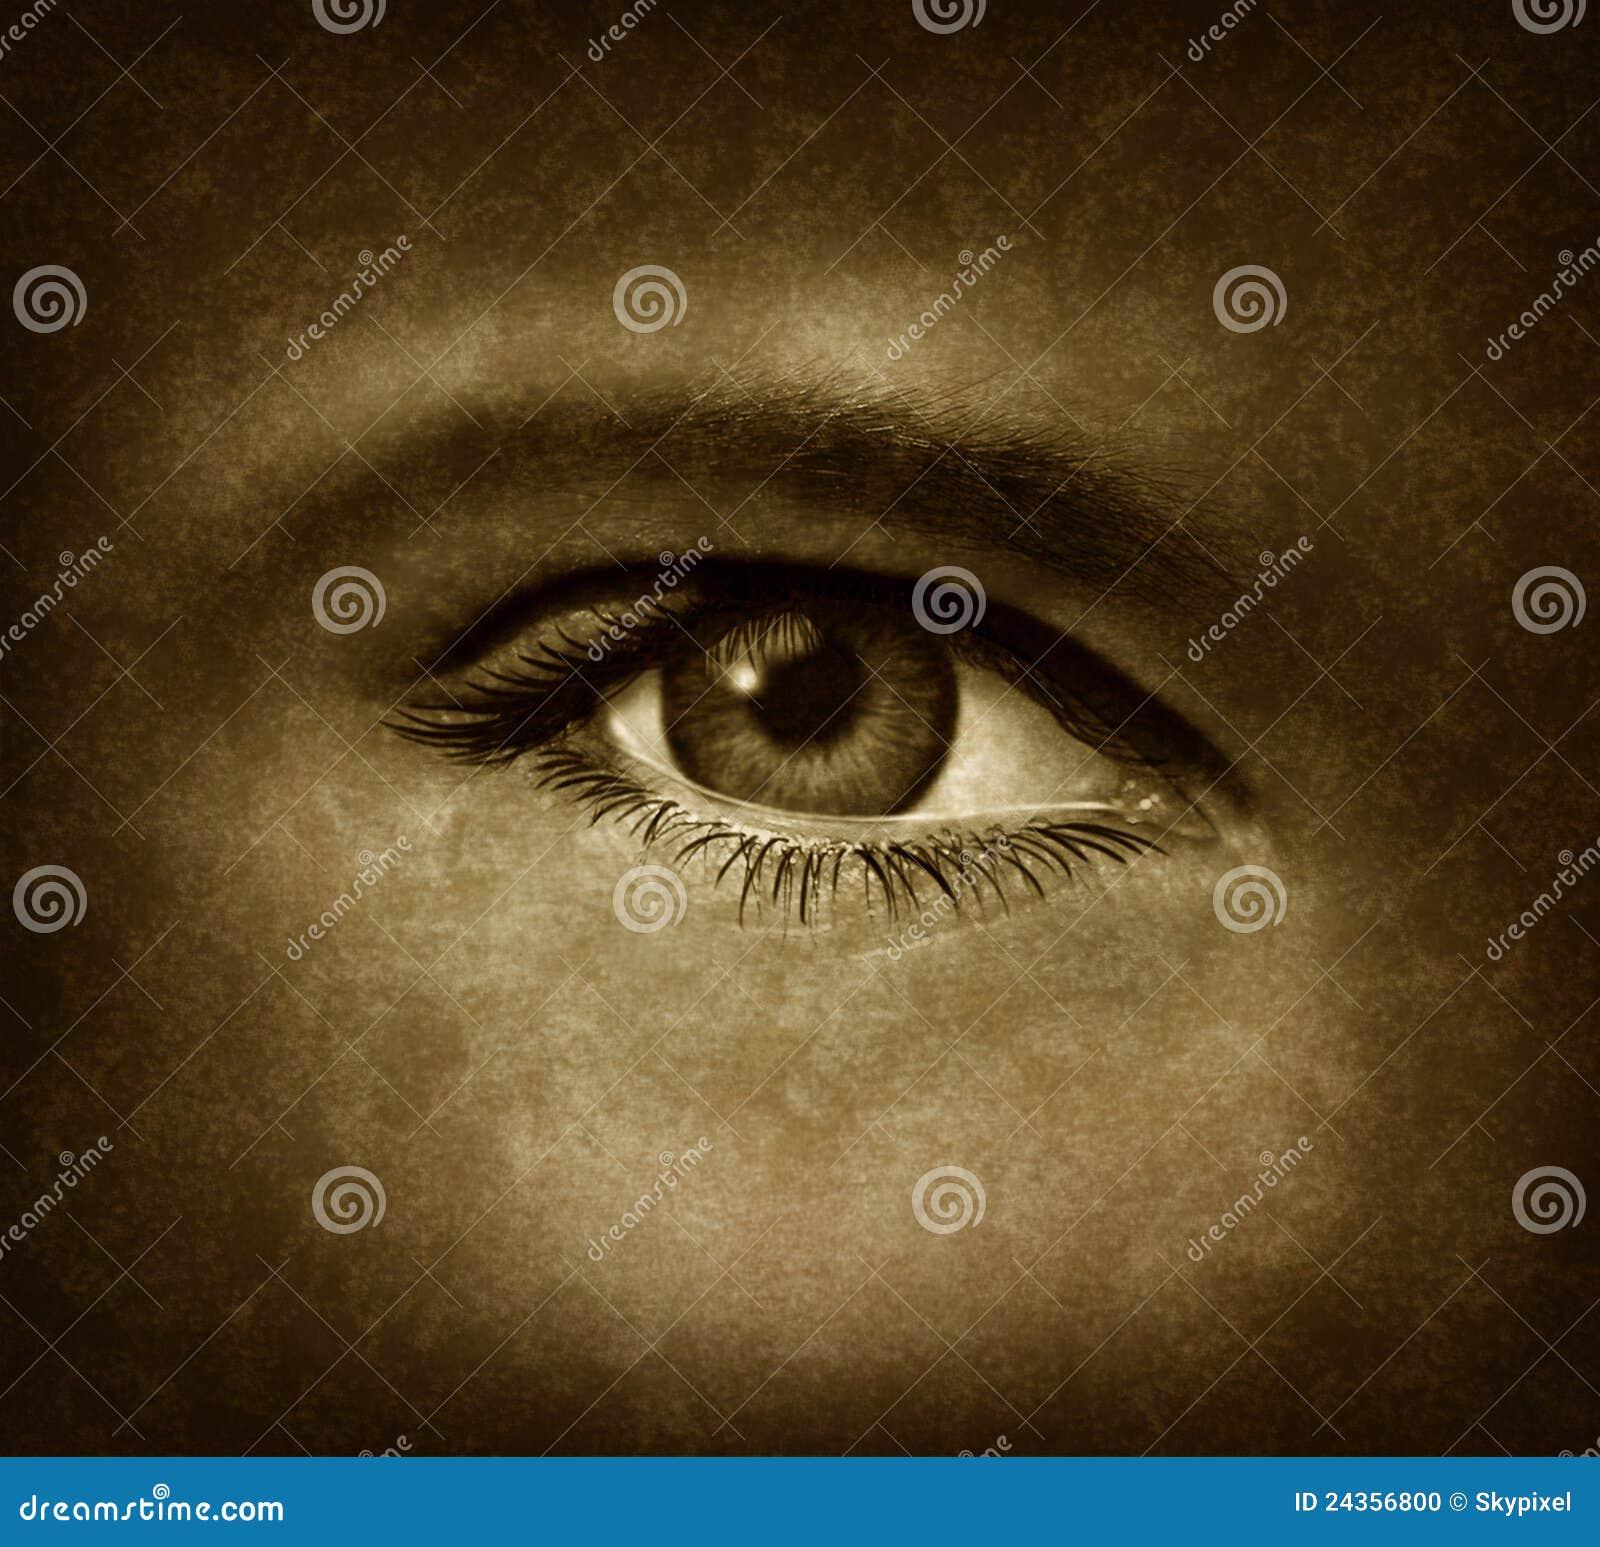 human sight essay